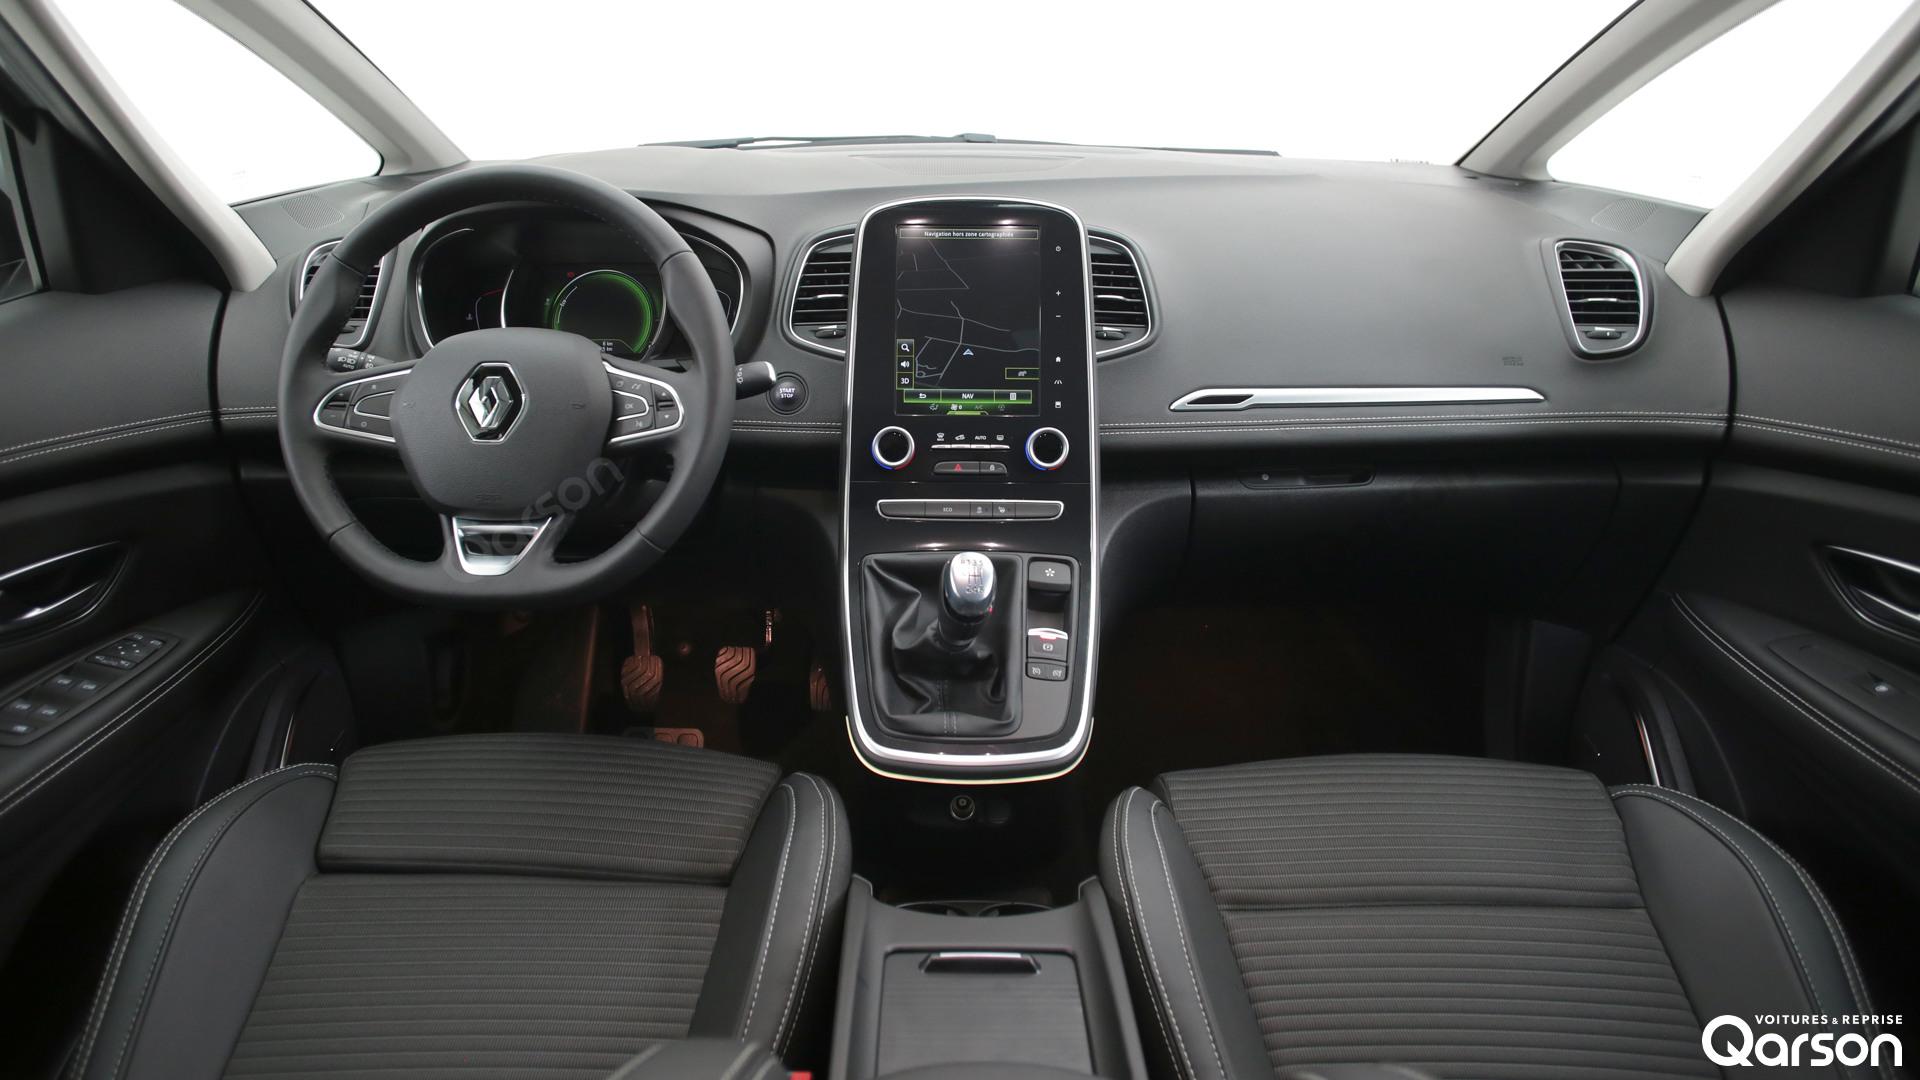 Tableau de bord Renault Scenic 5P